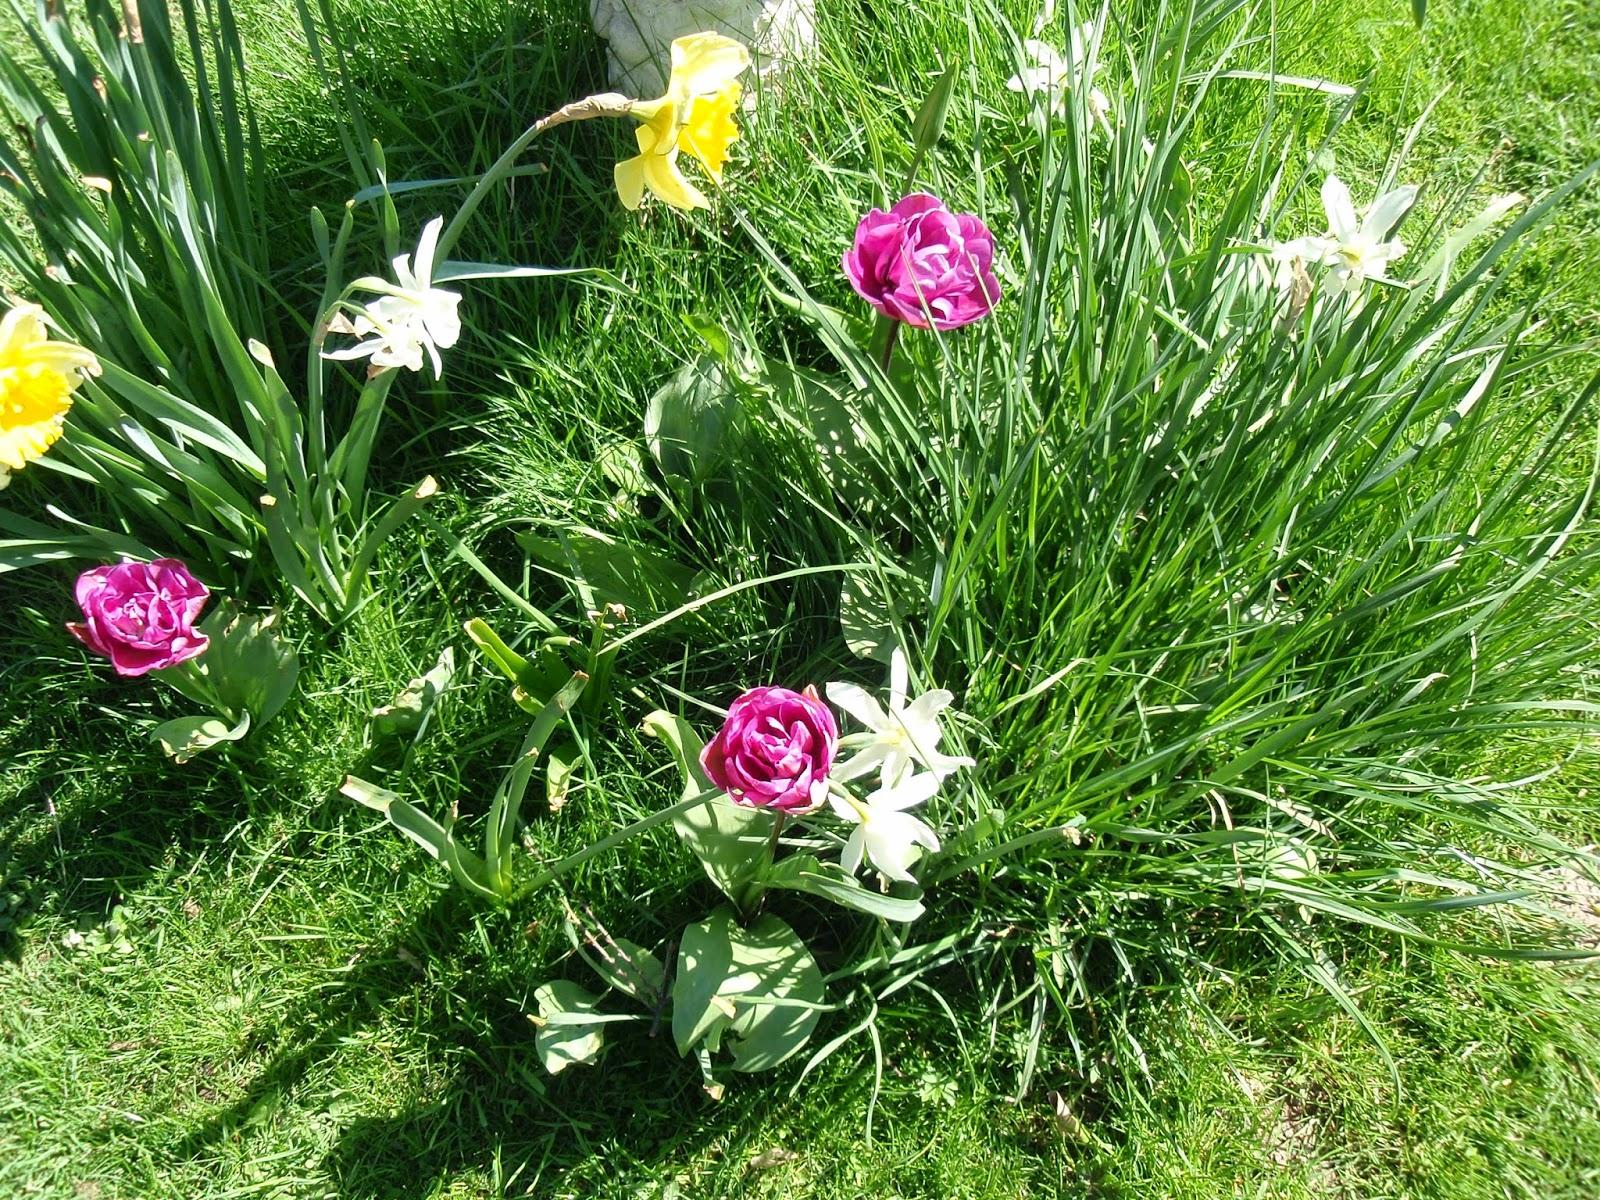 Tulips and narcisus